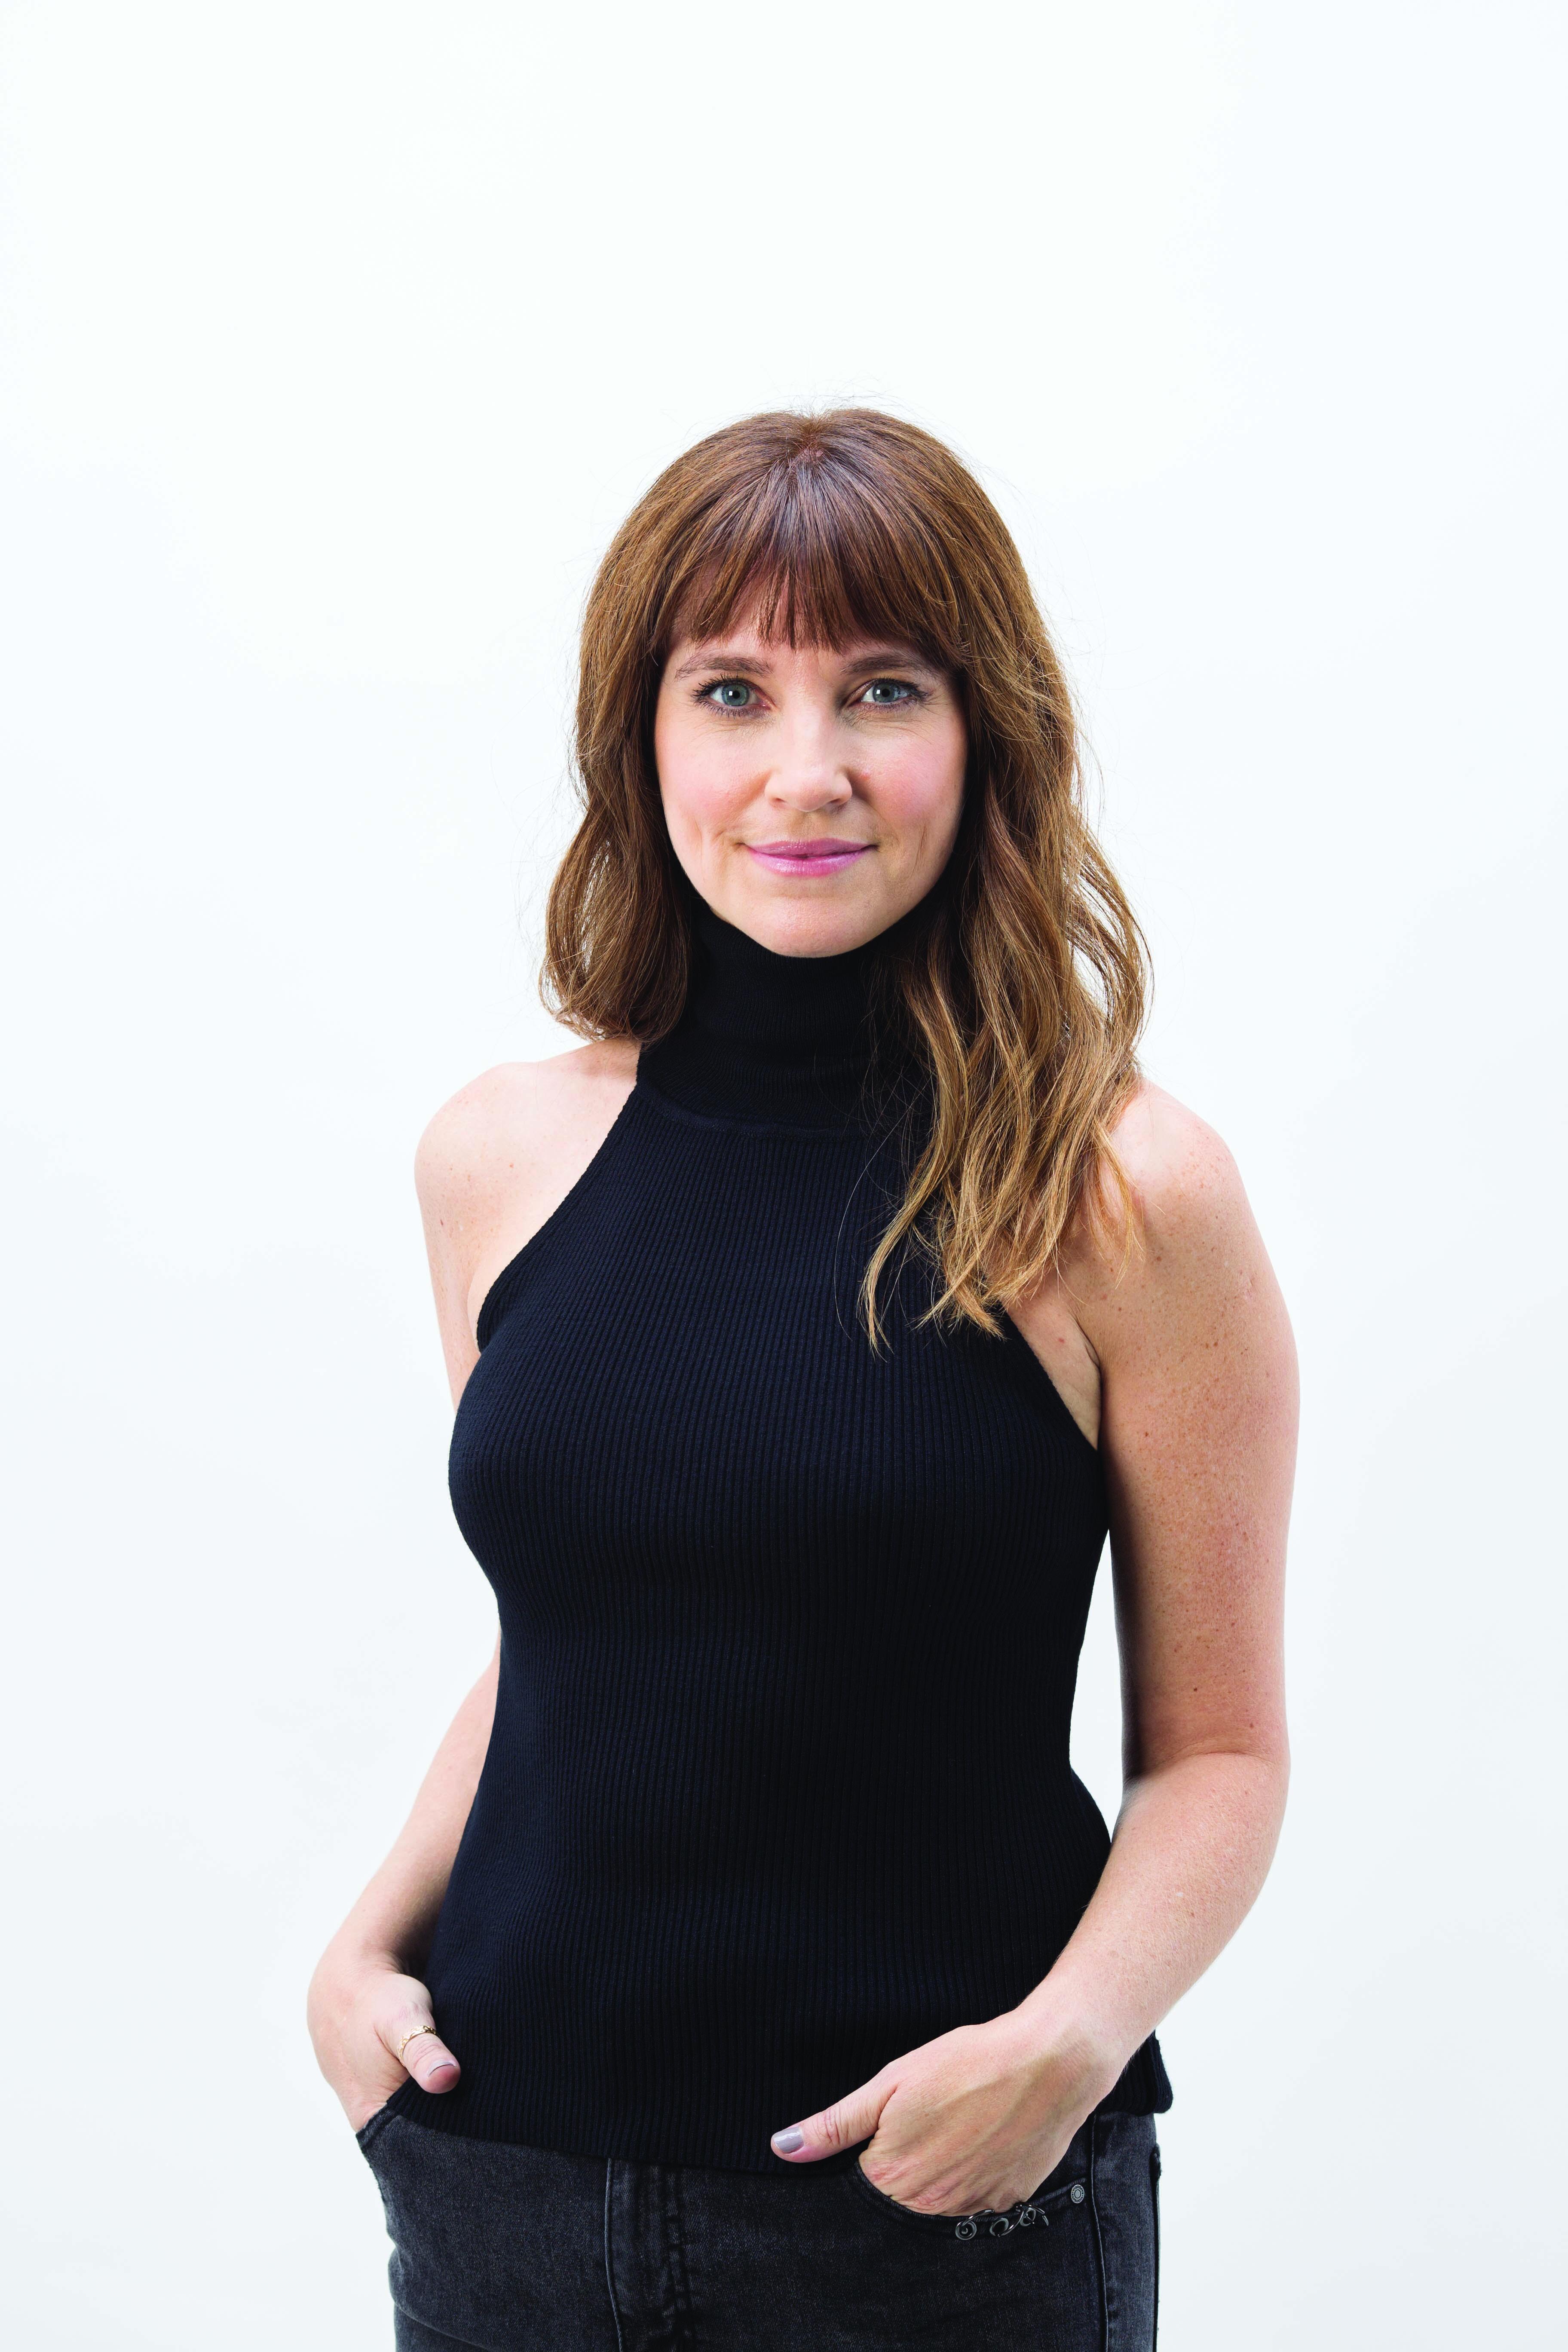 Soledad Simond